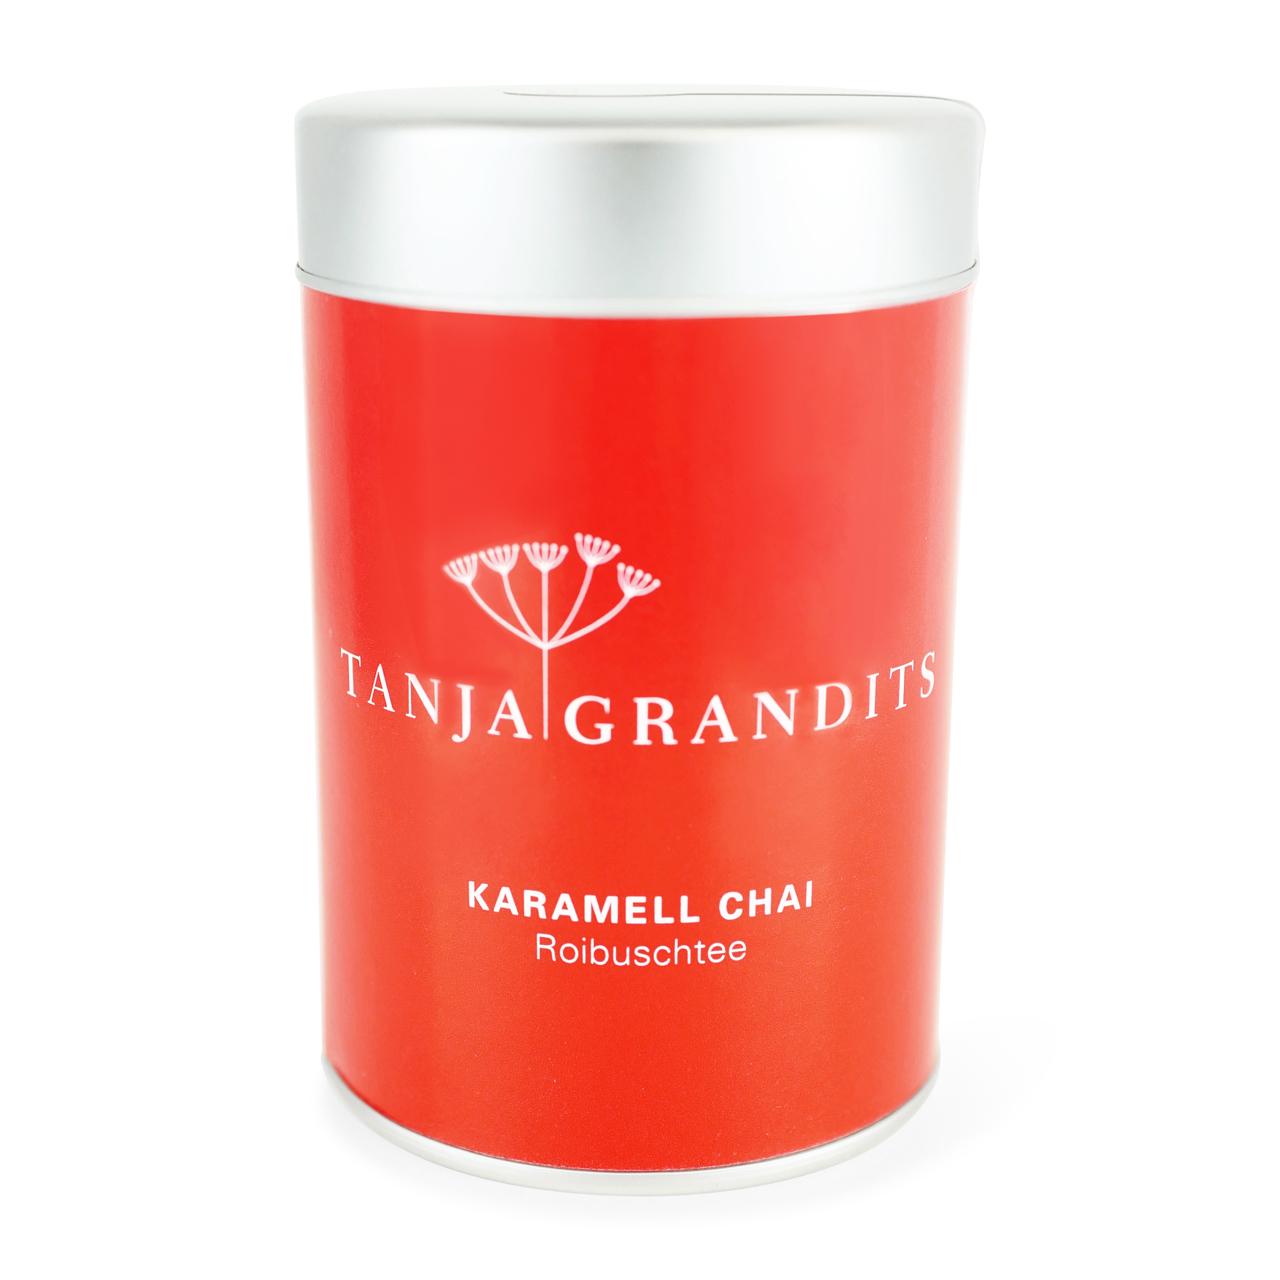 Tanja Grandits Karamell Chai Roibuschtee